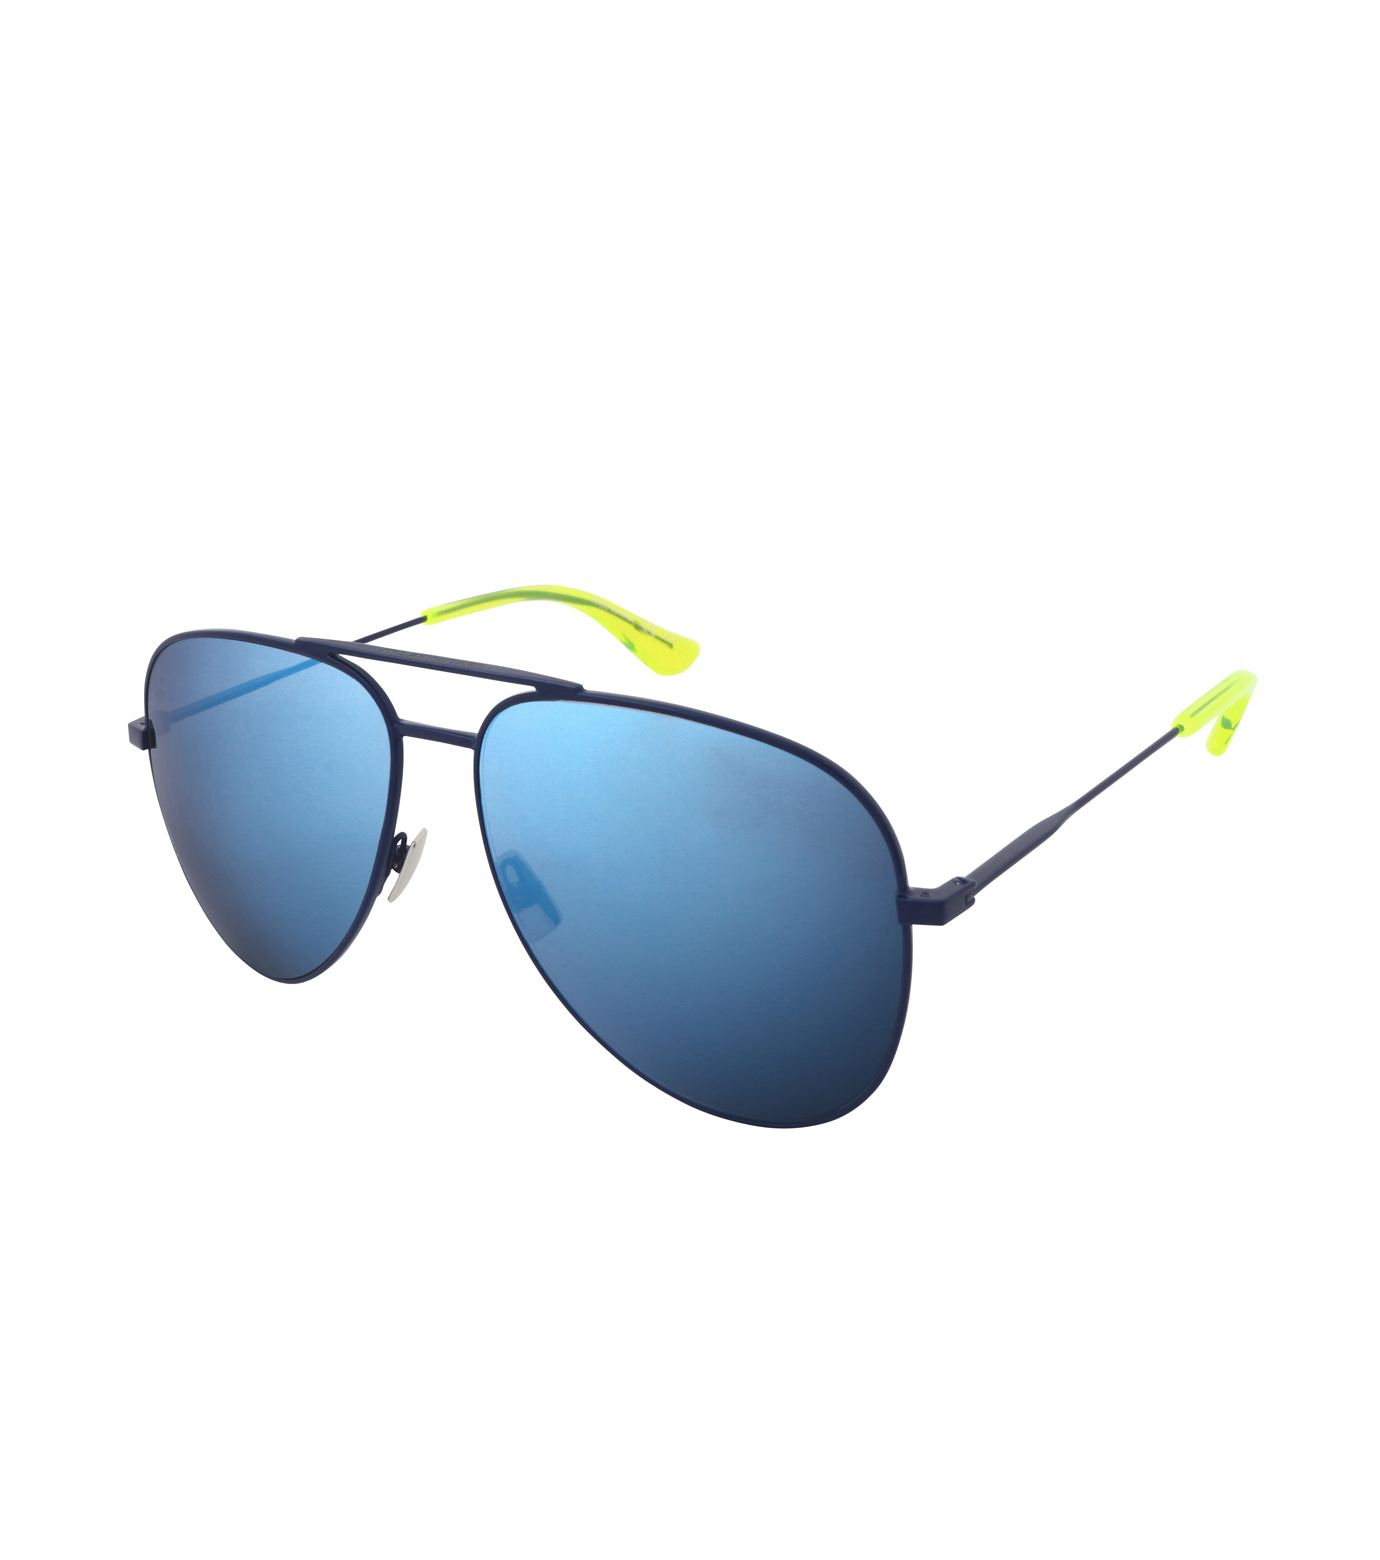 SAINT LAURENT(サンローラン)のTeardrop-BLUE(アイウェア/eyewear)-427758-Y9902-92 拡大詳細画像1